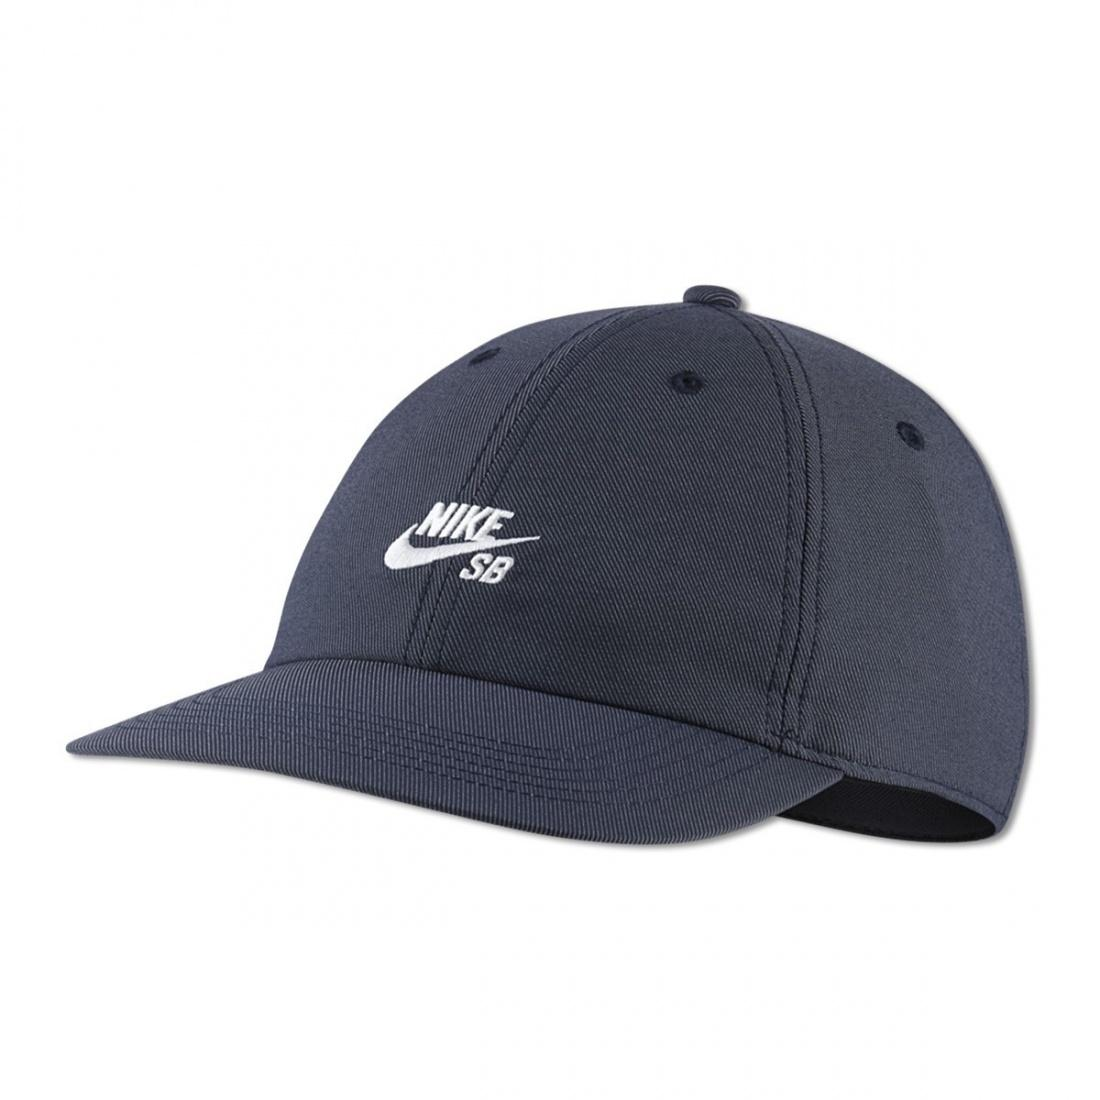 Бейсболка Nike SB H86 Cap Flat B купить в Boardshop №1